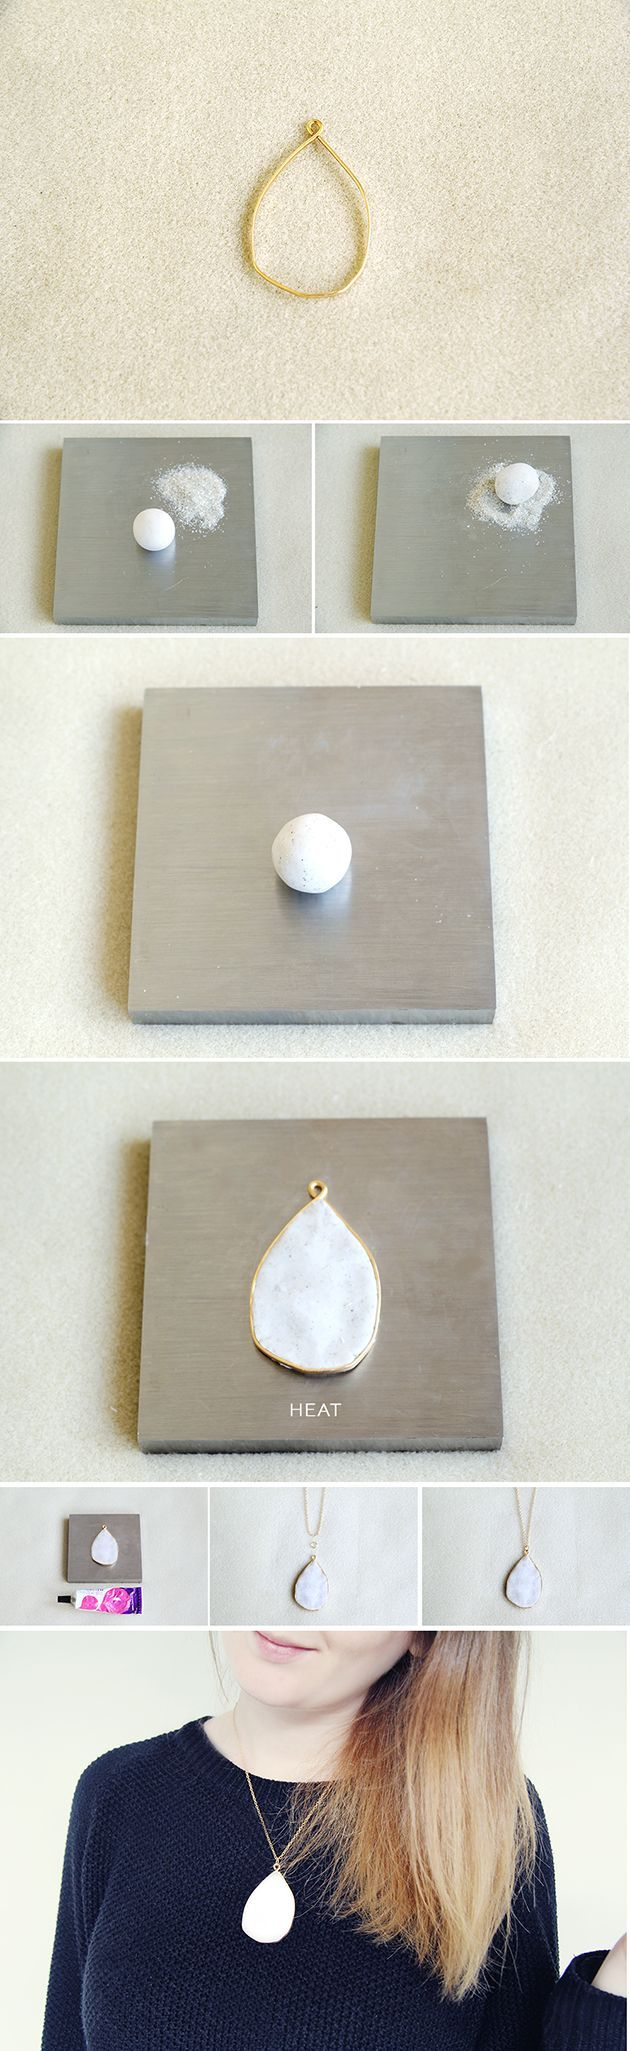 http://fallfordiy.com/blog/2013/12/31/diy-faux-geode-necklace/